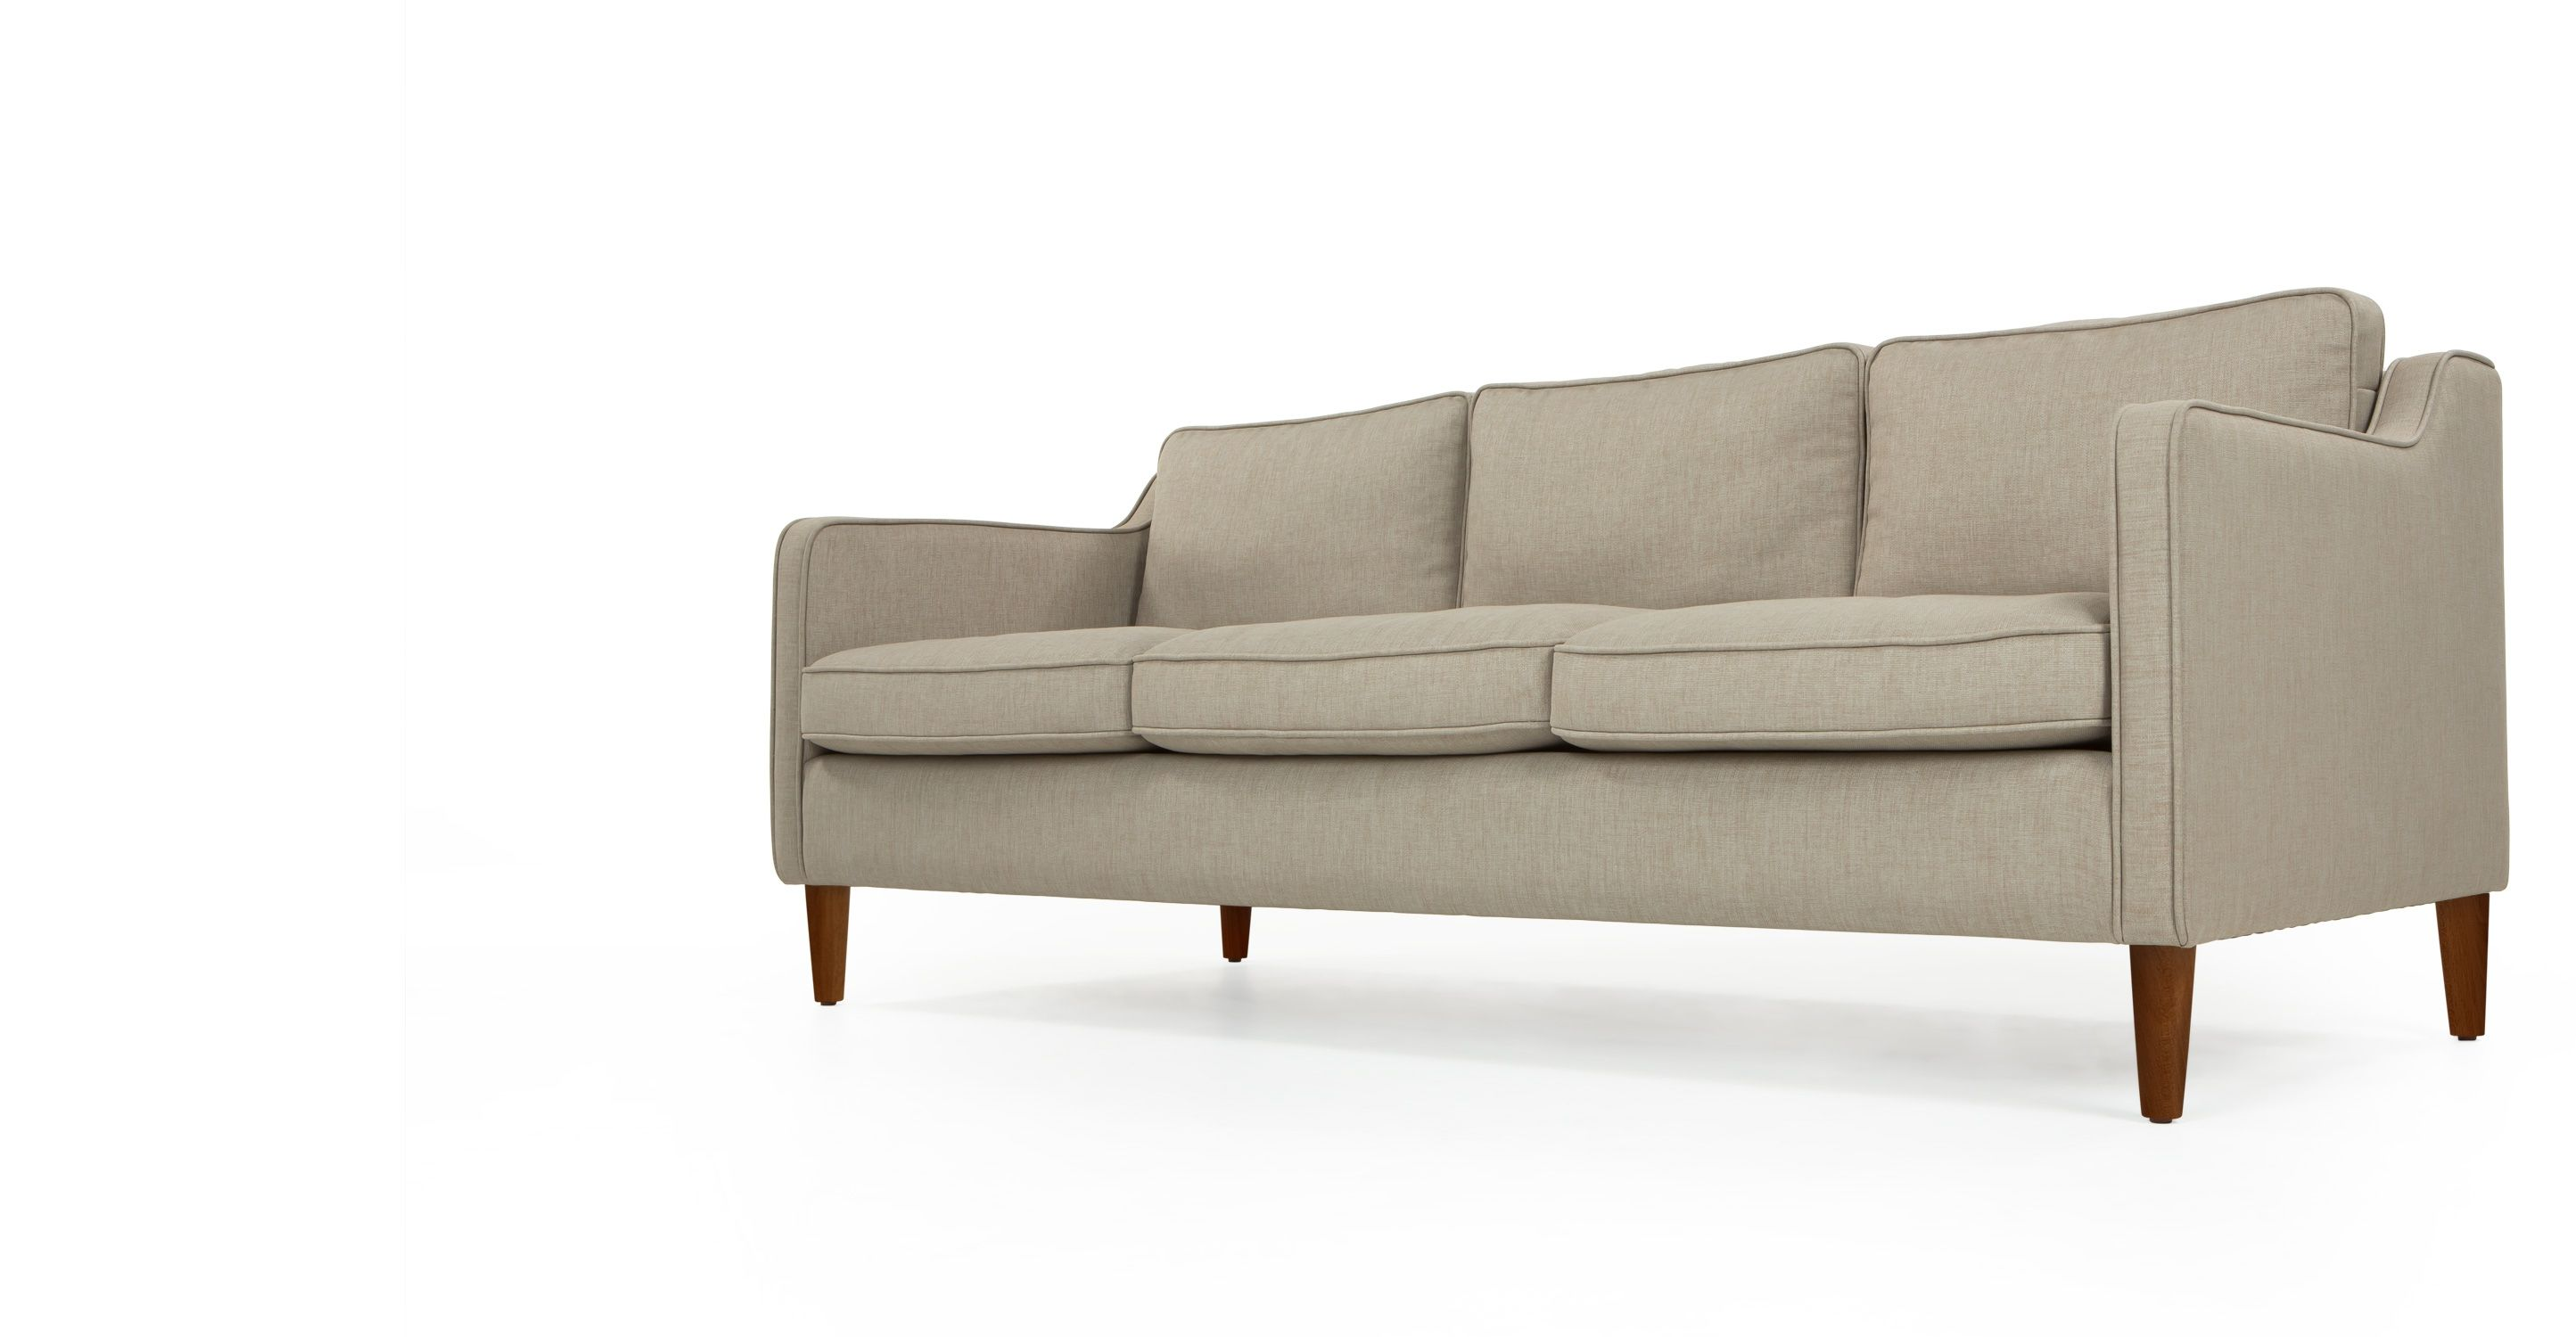 Walken 3 Seater Sofa Calico Beige I N T E R I O R S